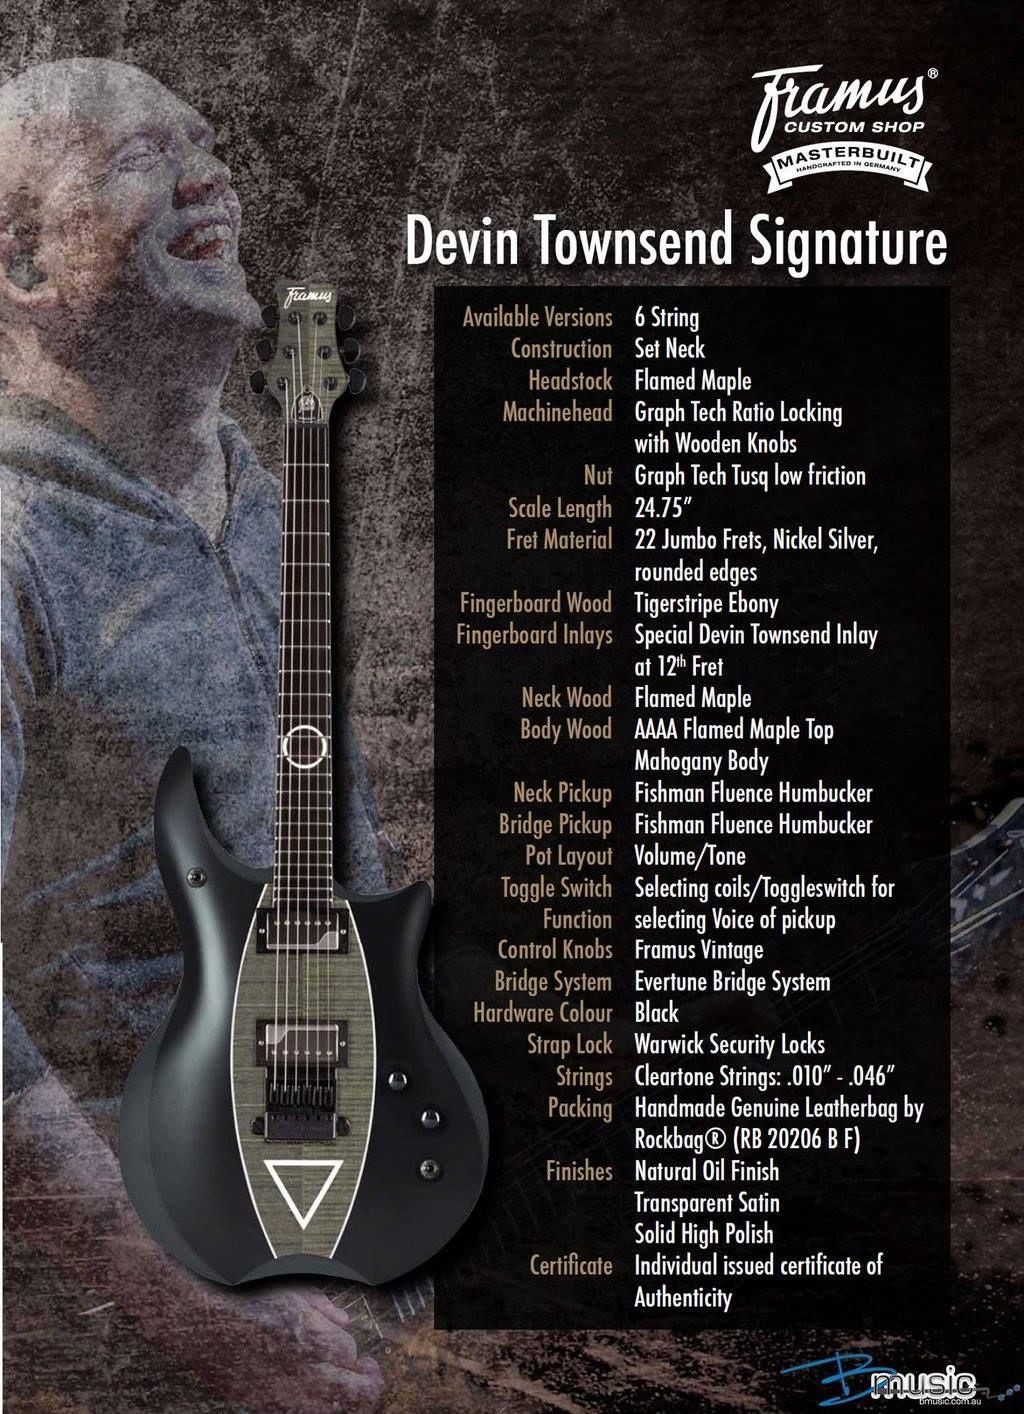 devin townsend framus signature guitars signature guitar guitar music. Black Bedroom Furniture Sets. Home Design Ideas